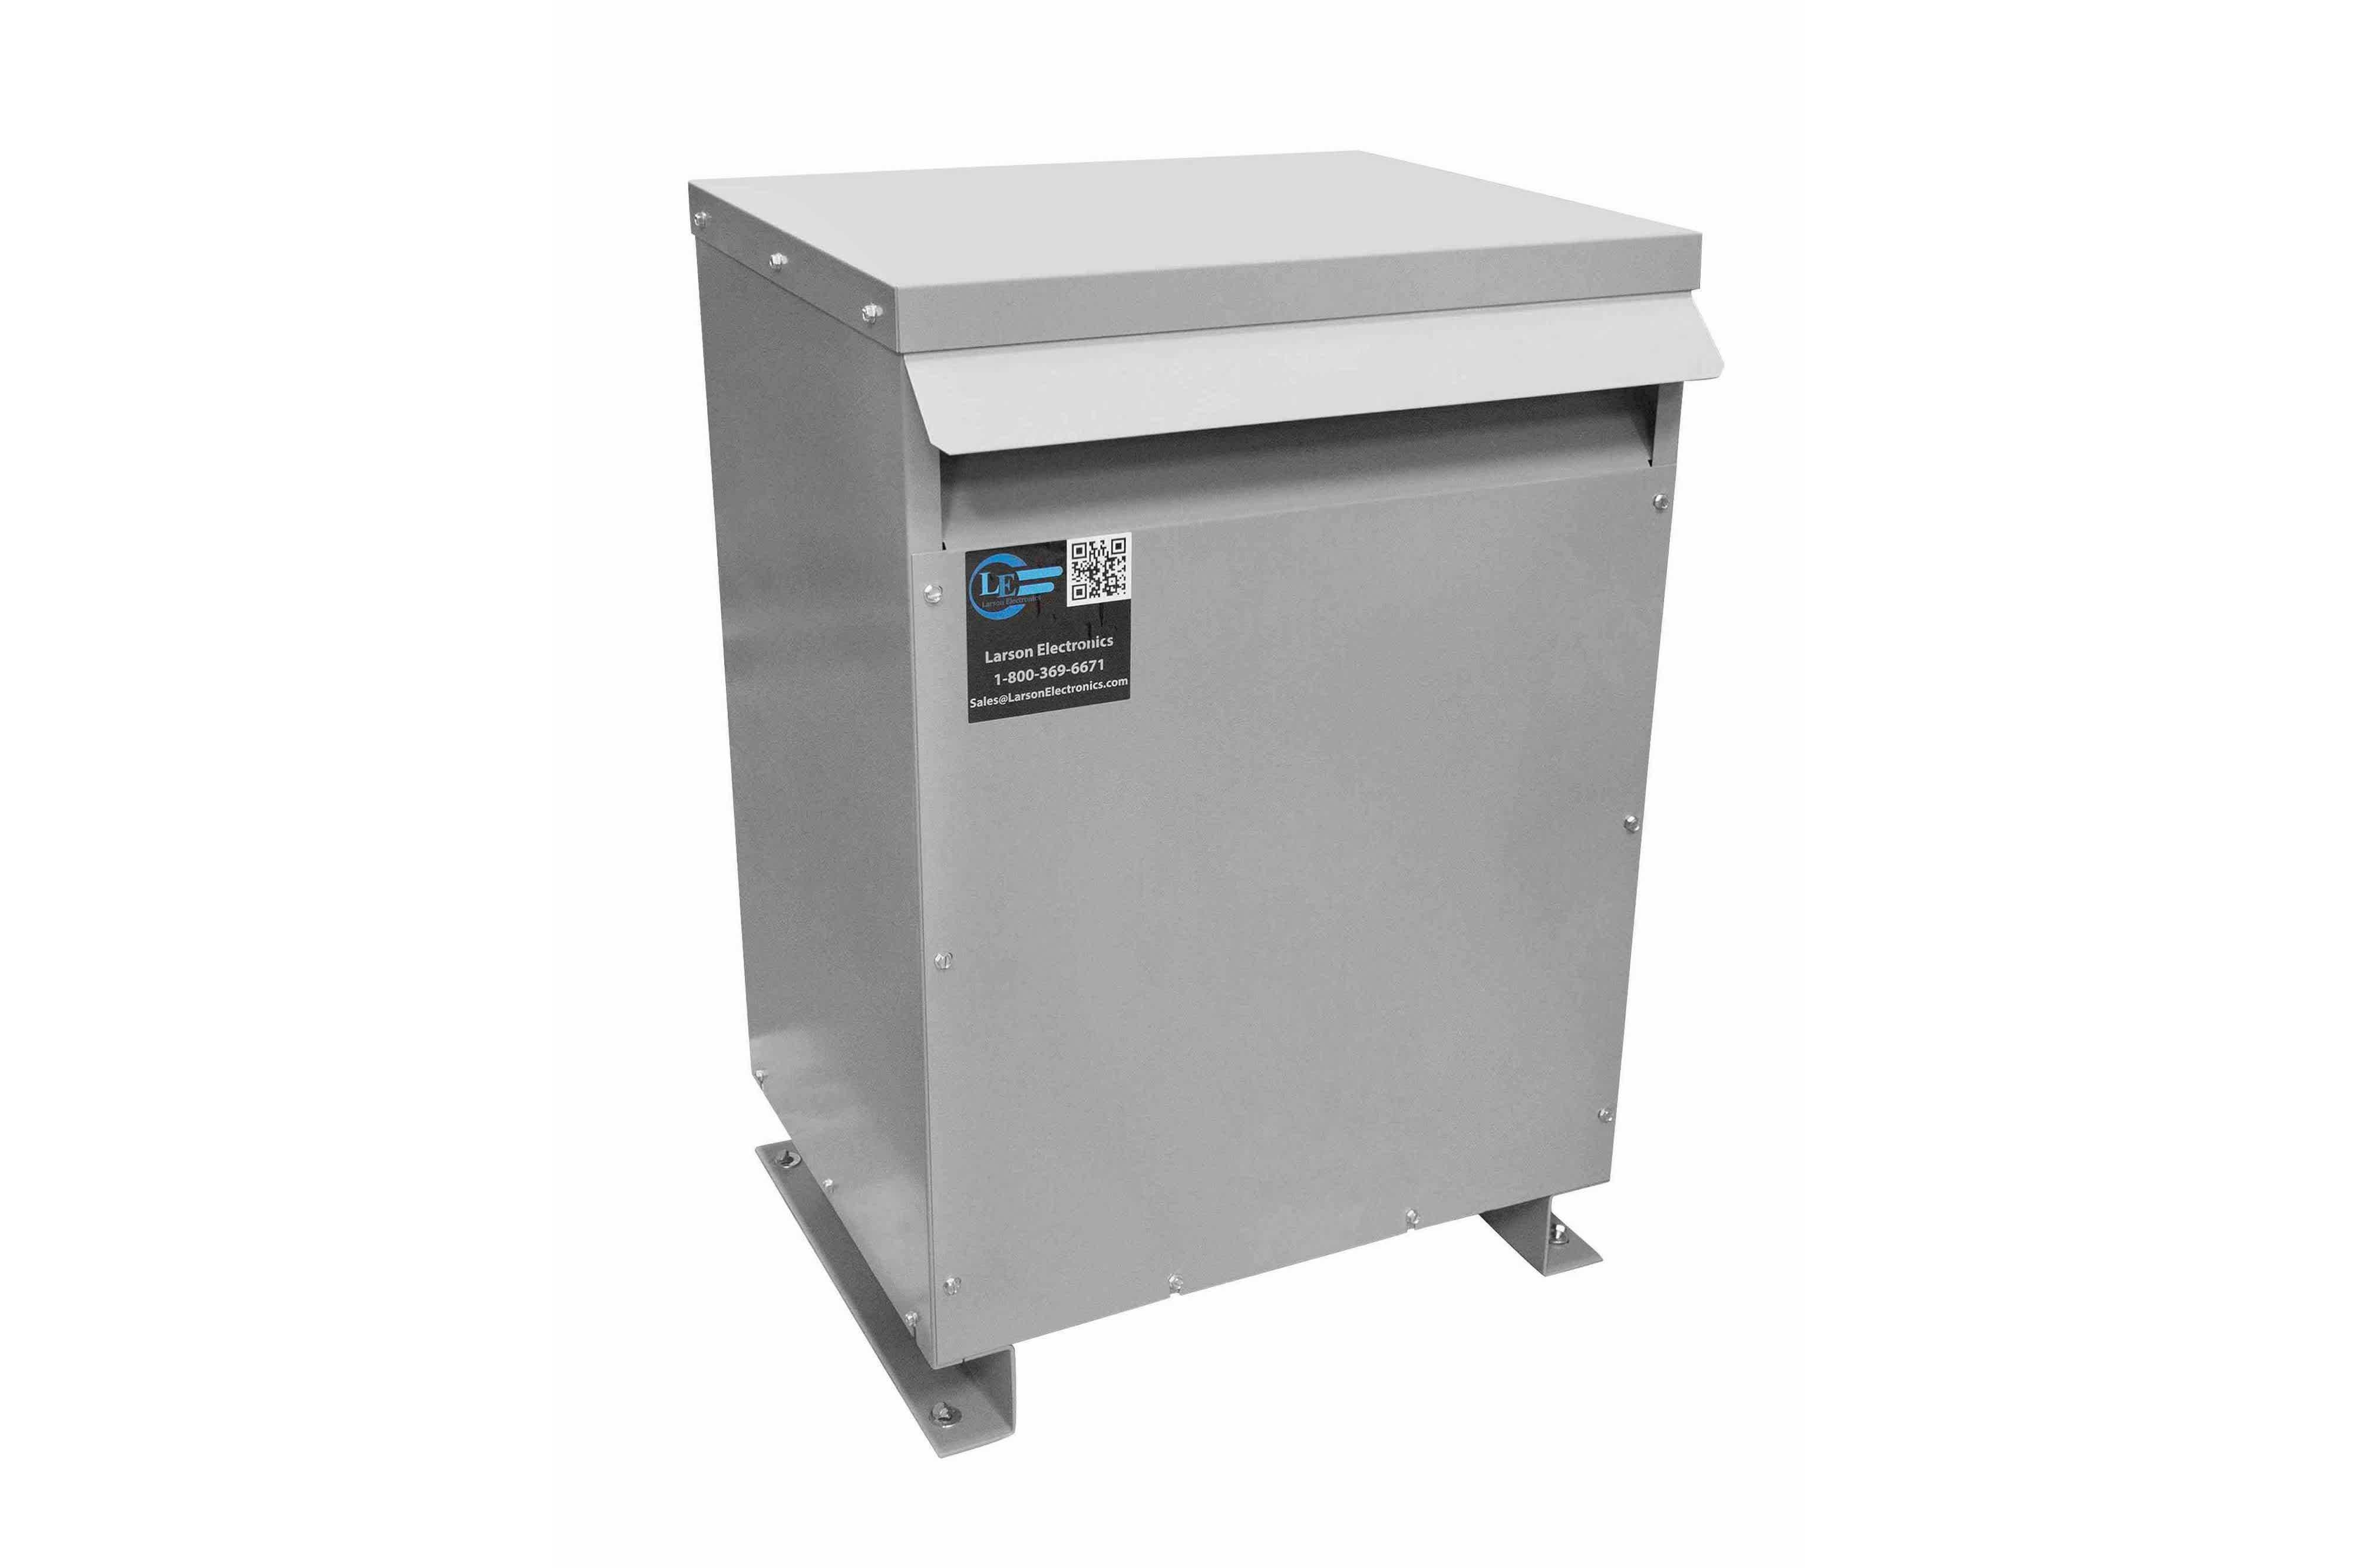 13 kVA 3PH Isolation Transformer, 600V Wye Primary, 208Y/120 Wye-N Secondary, N3R, Ventilated, 60 Hz